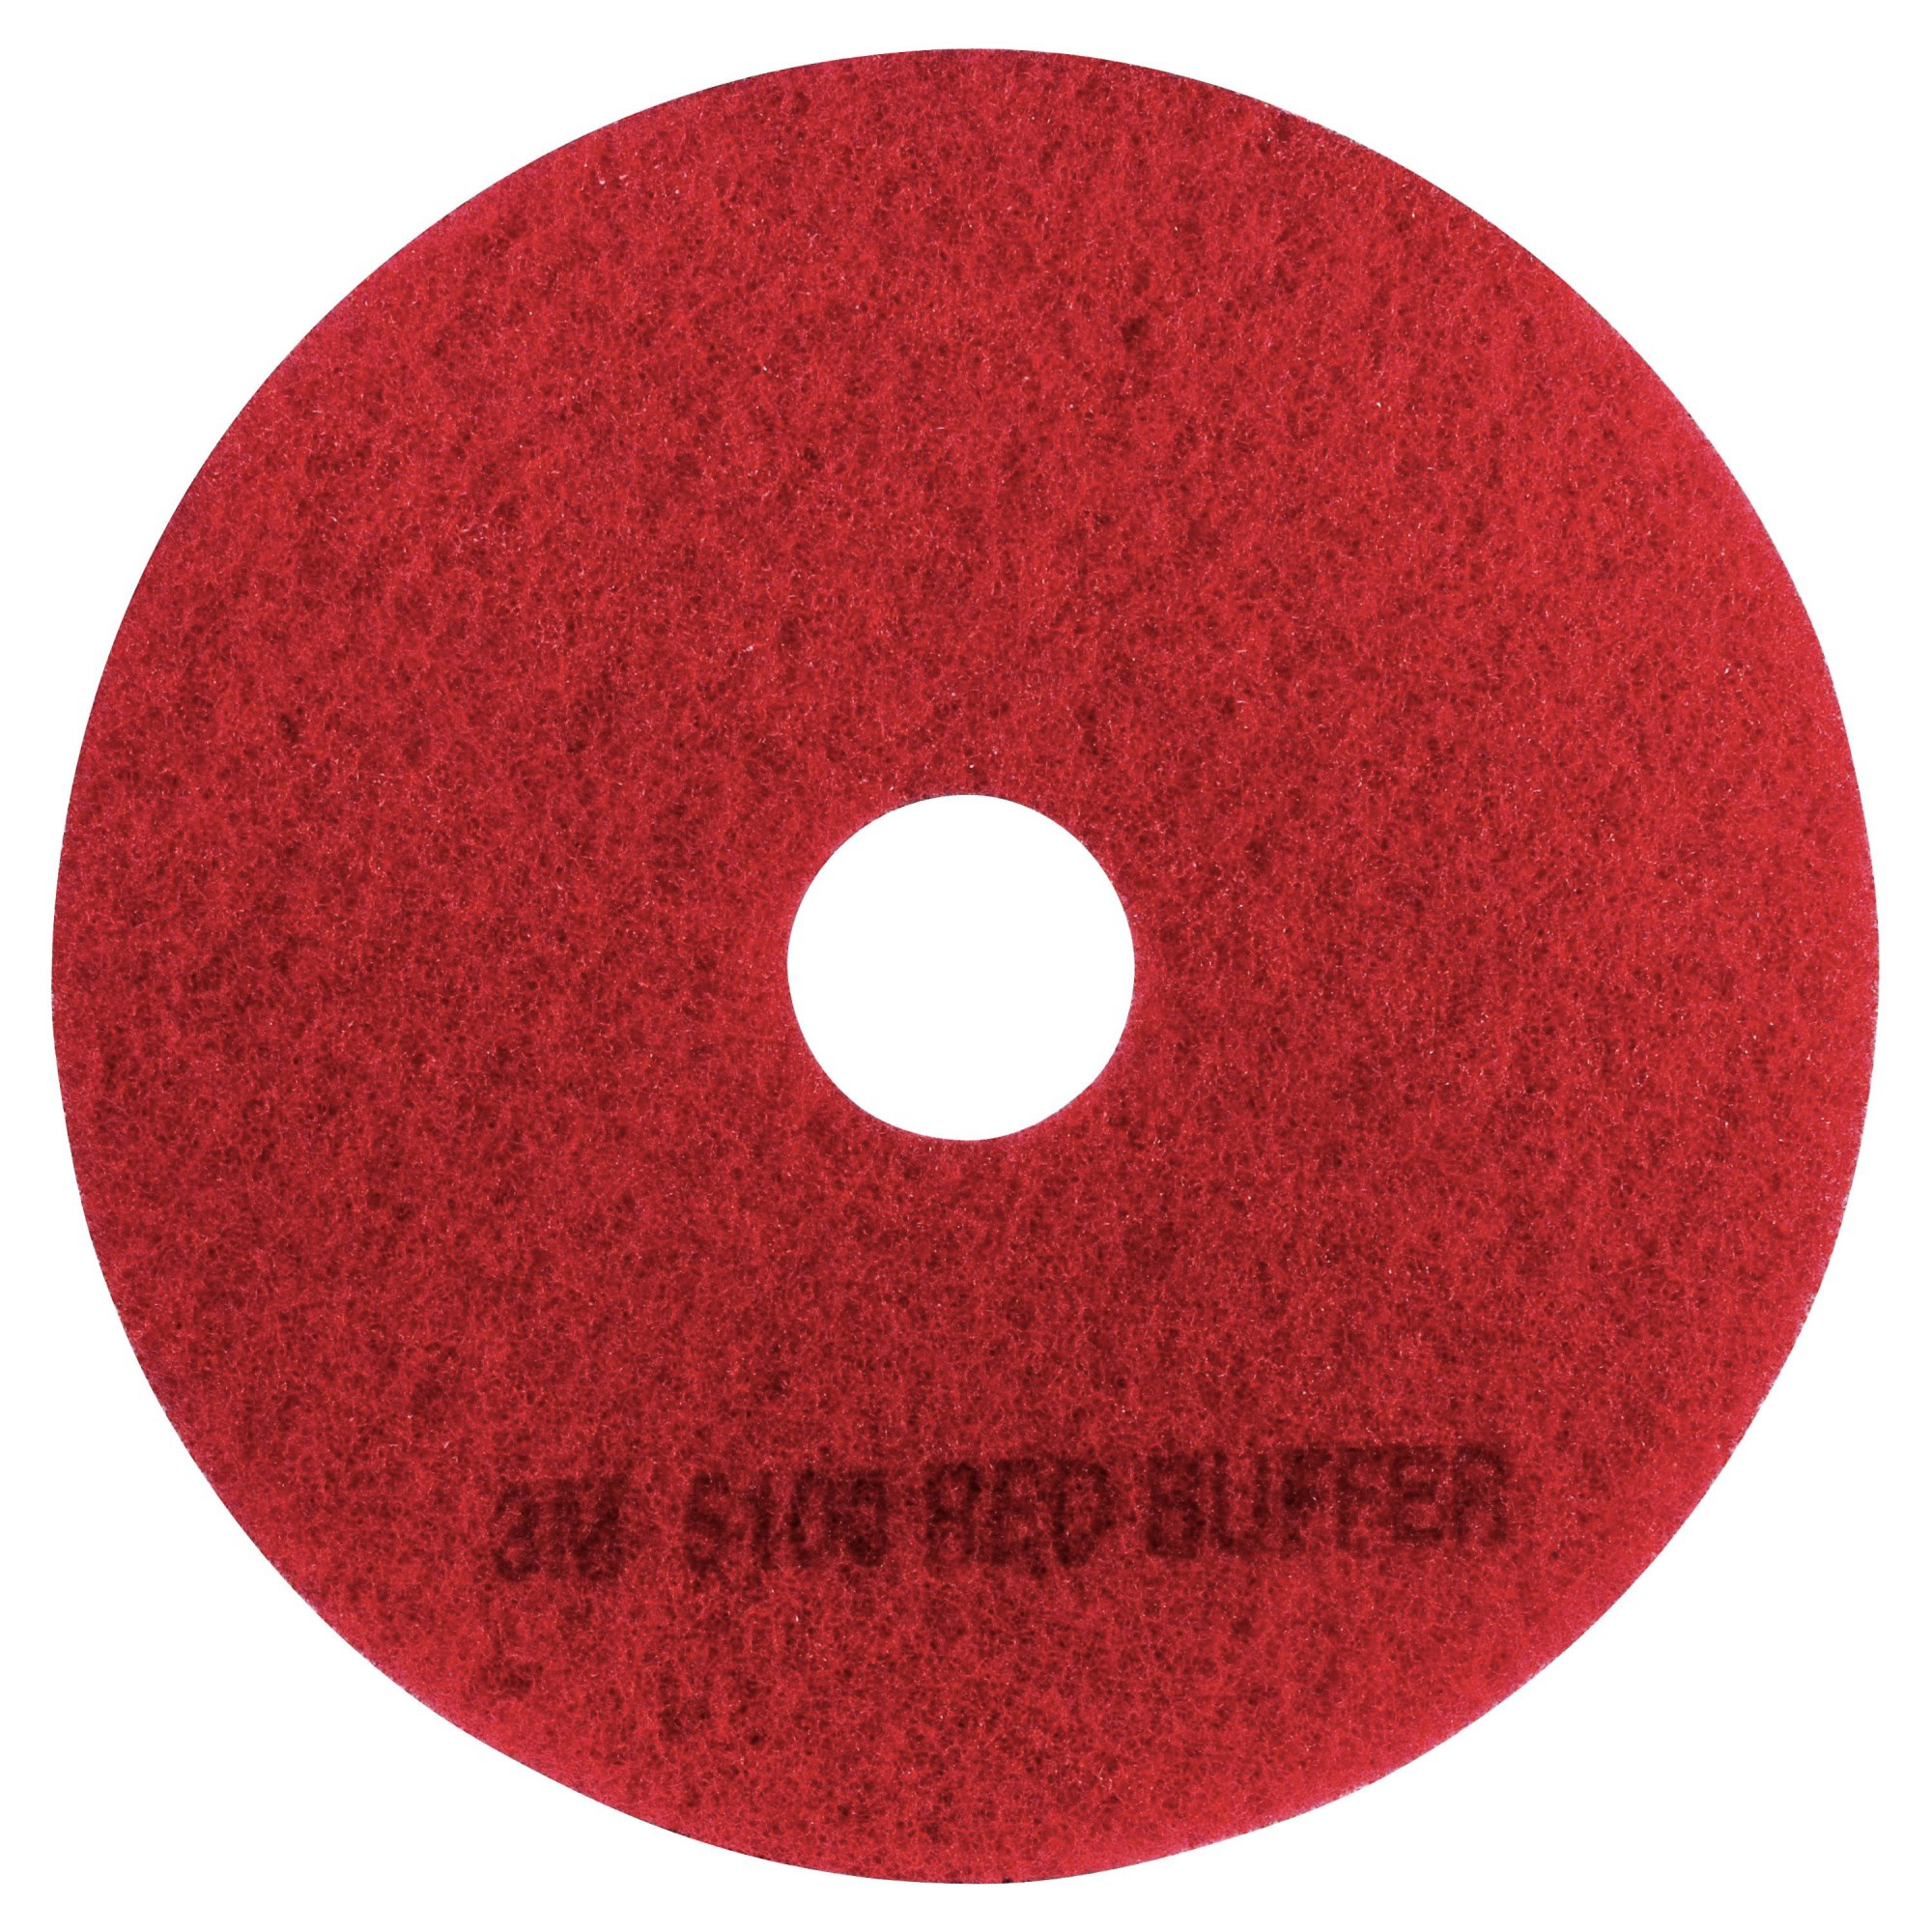 "3M™ 5100 Buffer Floor Pads, 16"" Diameter, Red, Box Of 5"